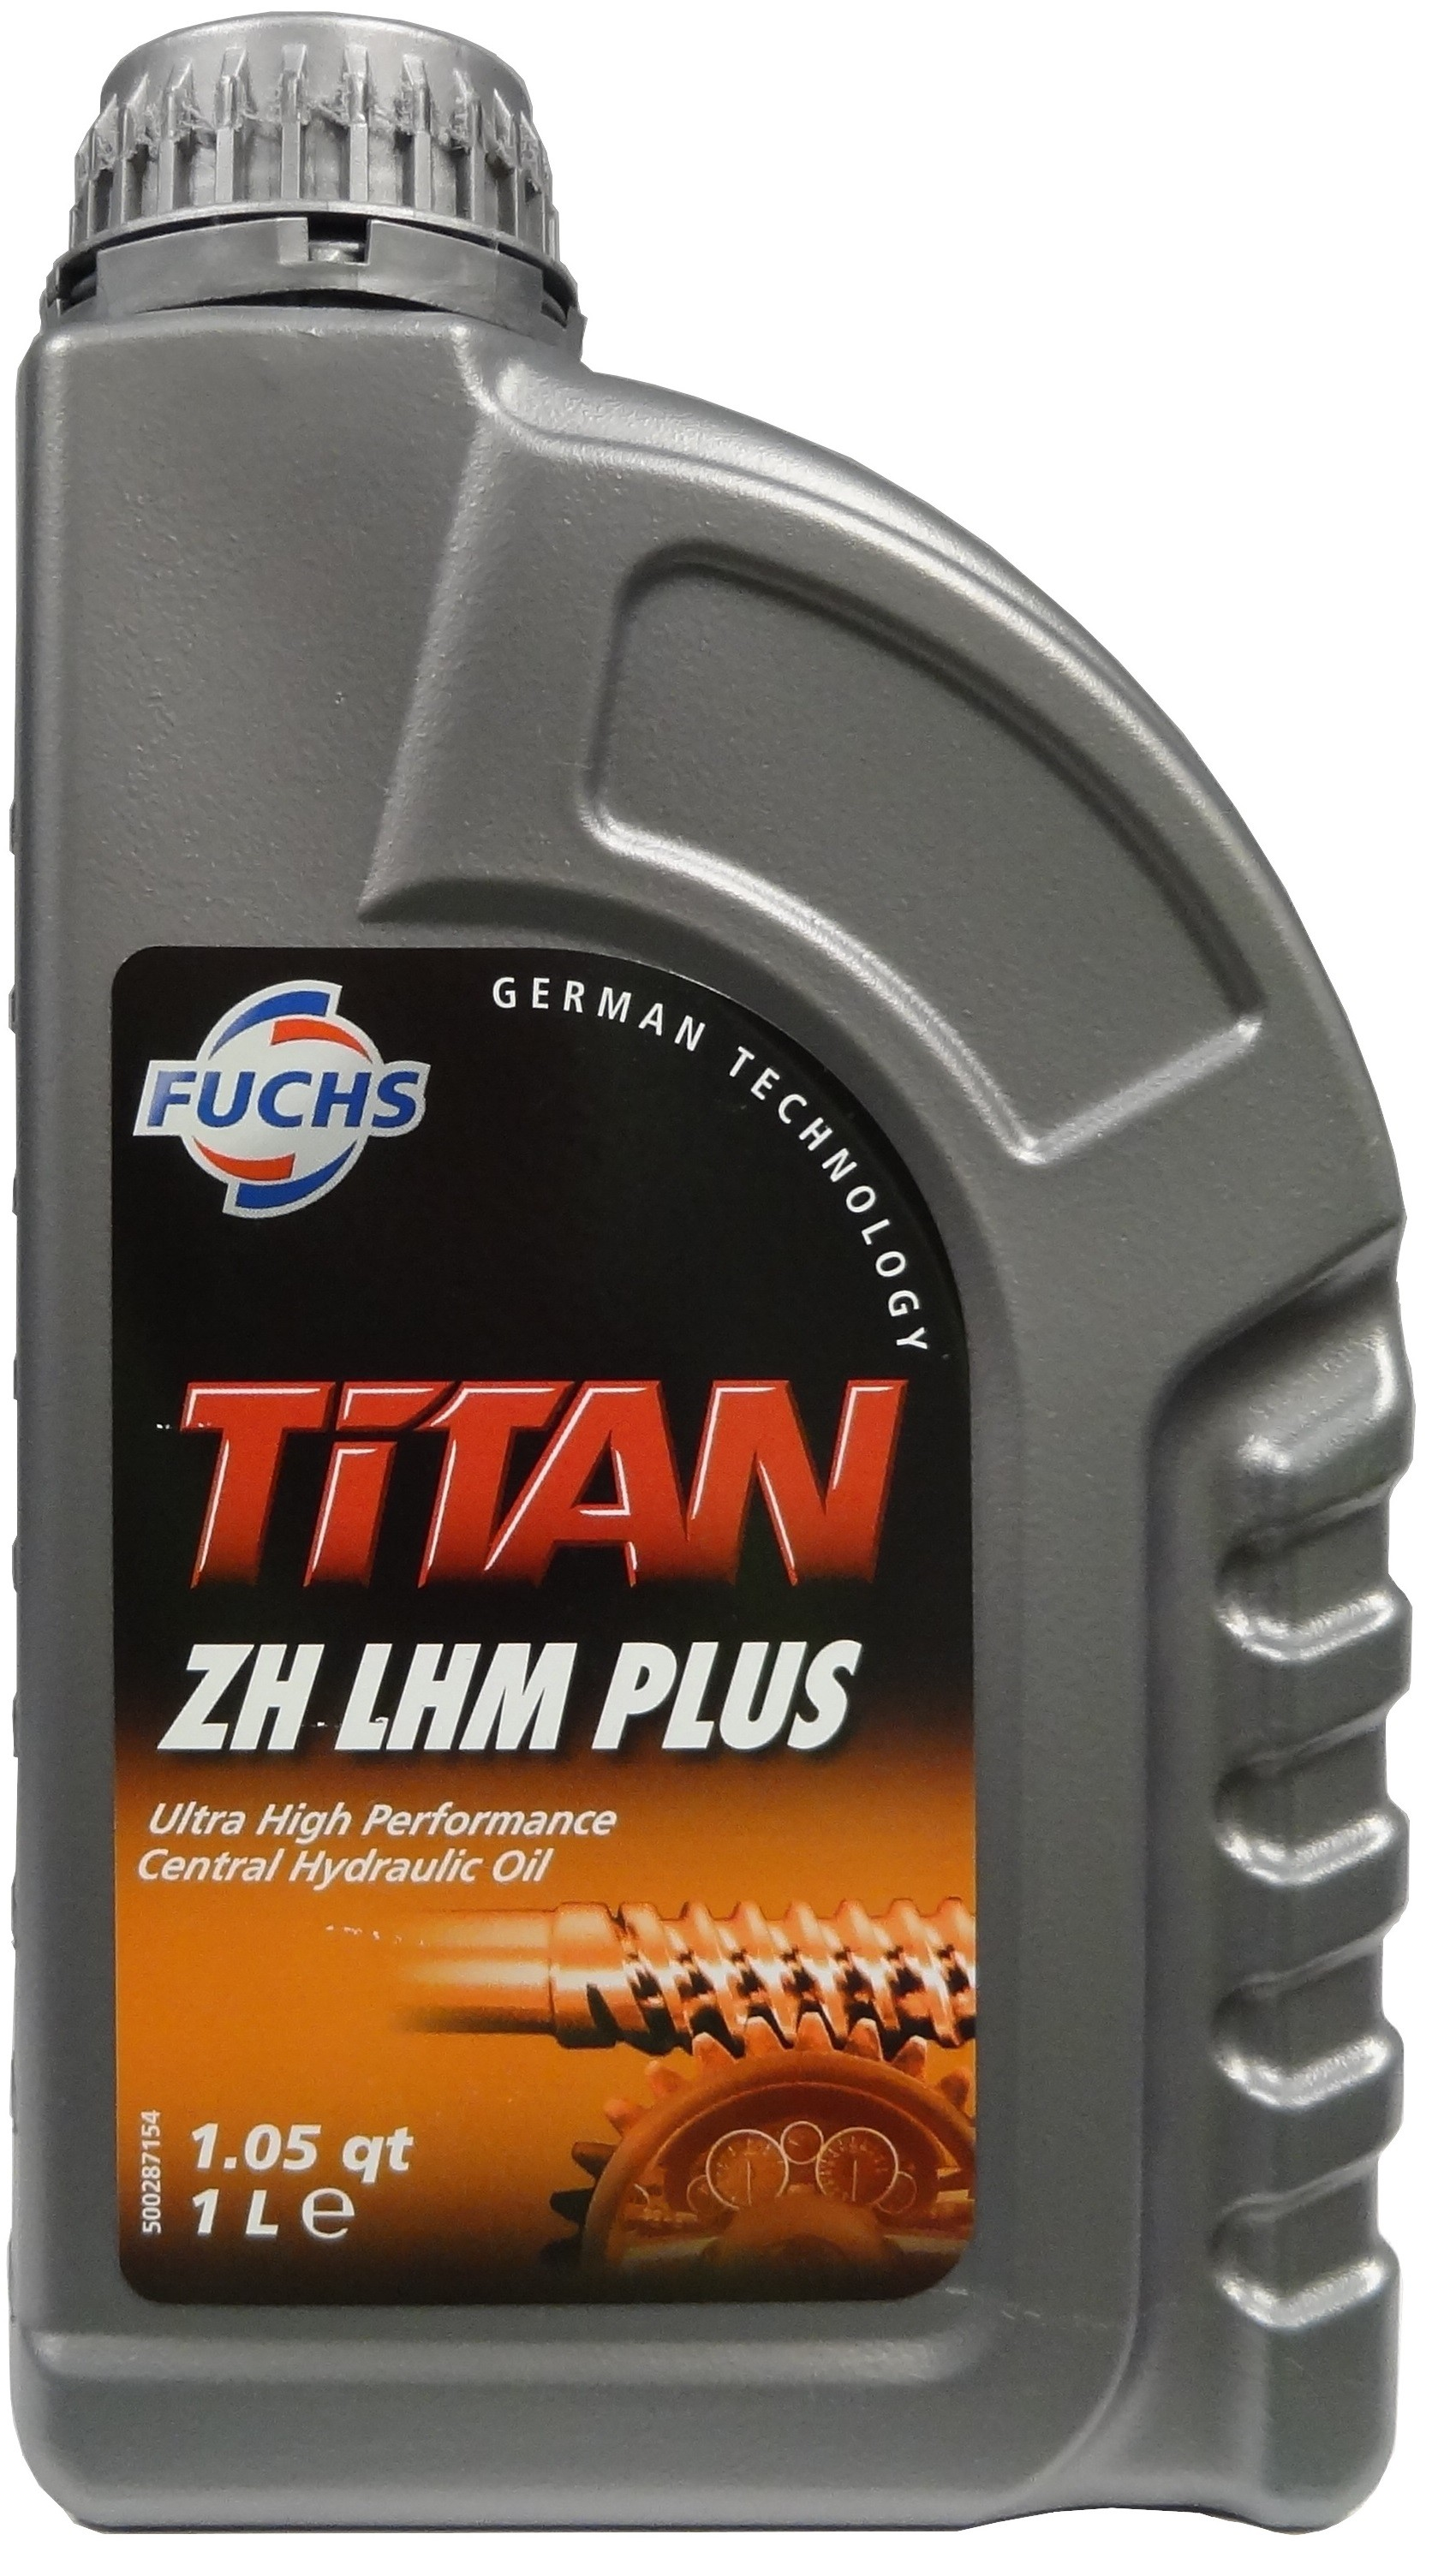 FUCHS TITAN ZH LHM PLUS 1L